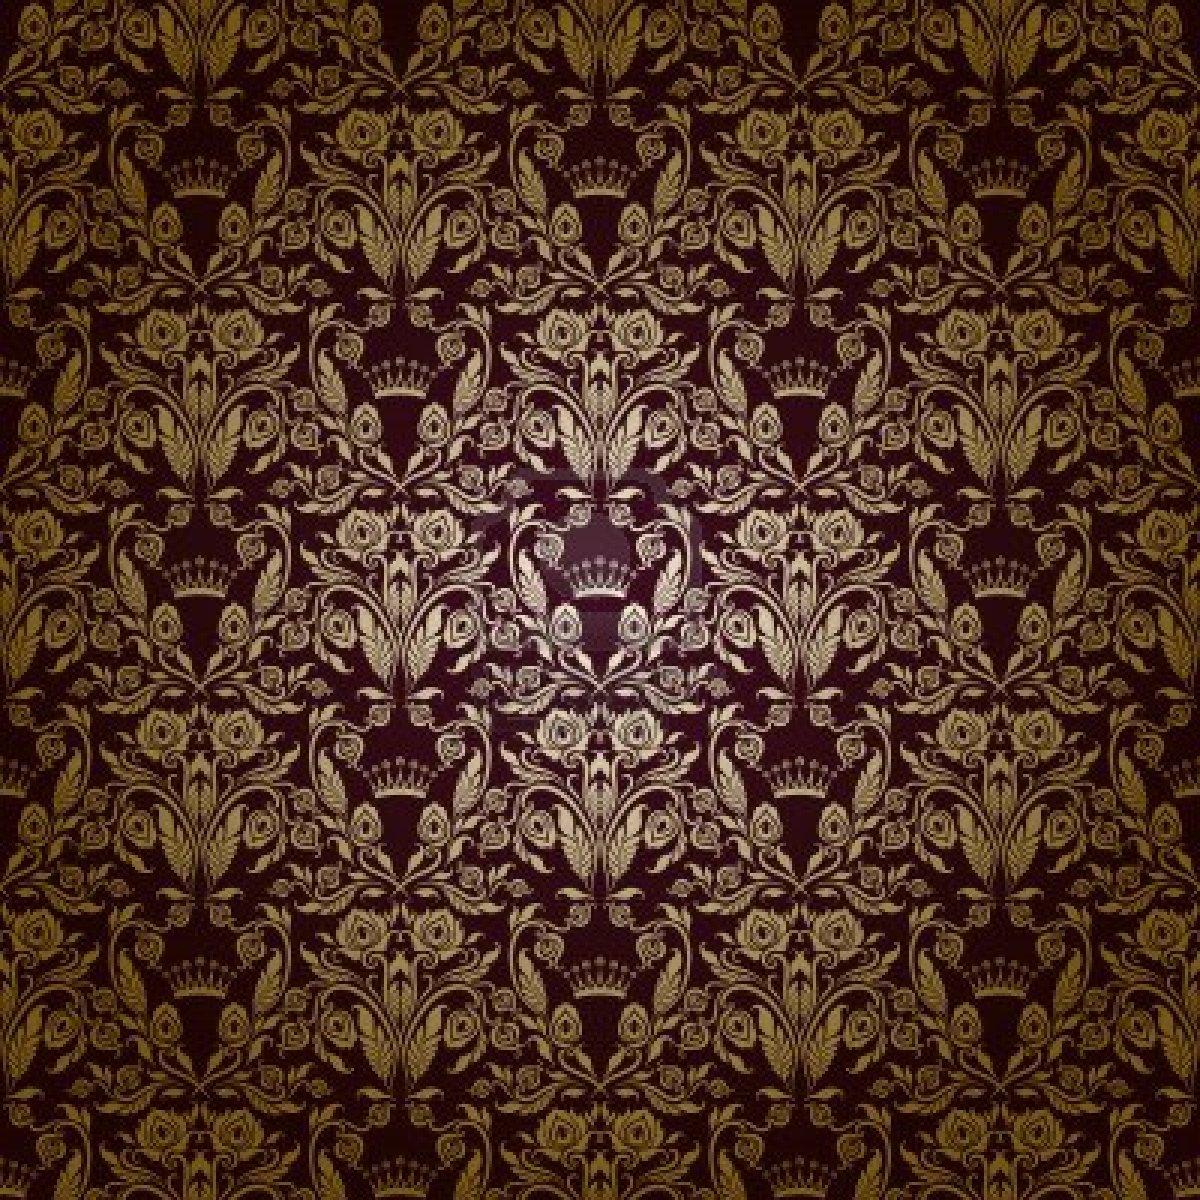 swirling royal pattern wallpaper - photo #12